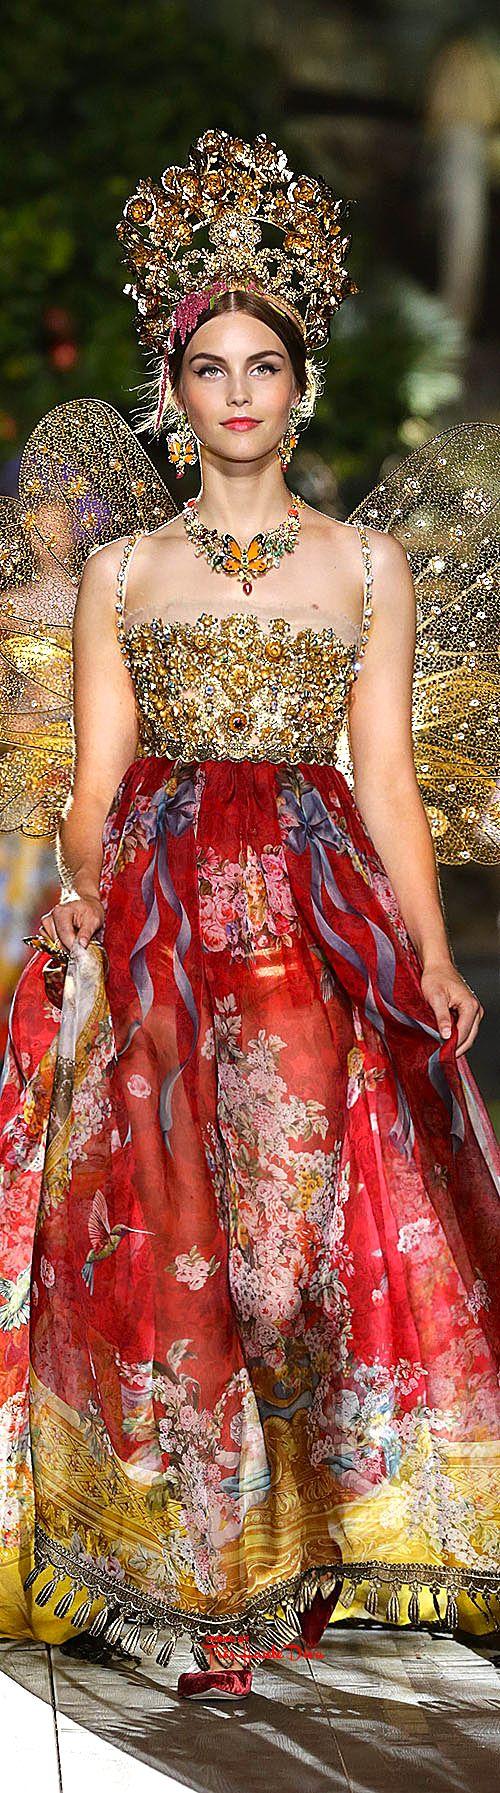 Très Haute Diva ♔ Dolce & Gabbana Alta Moda Fall/Winter 2015-16 #Portofino ♔ For more images visit my website http://www.treshautediva.com/